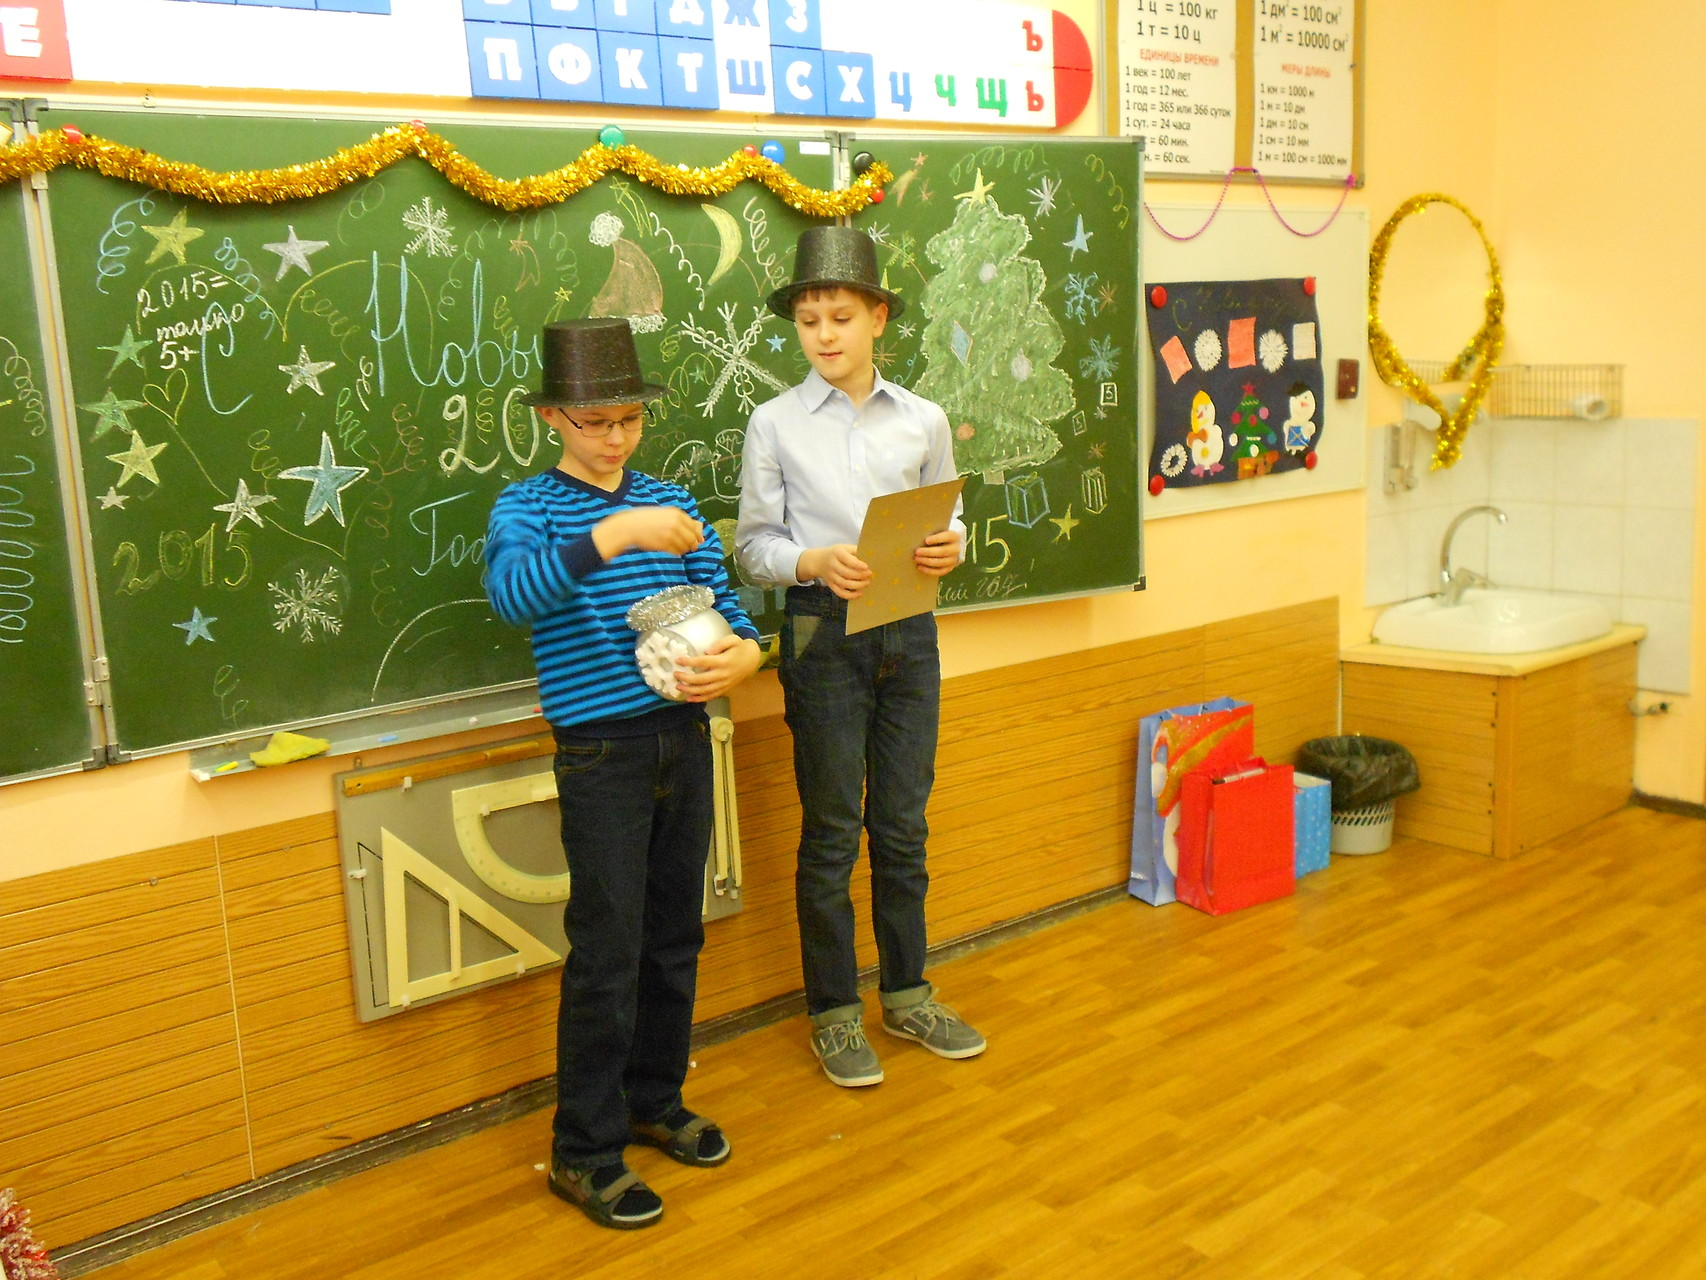 «Письма удачи» приготовили Моисеенко Григорий и Кевлишвили Никита.